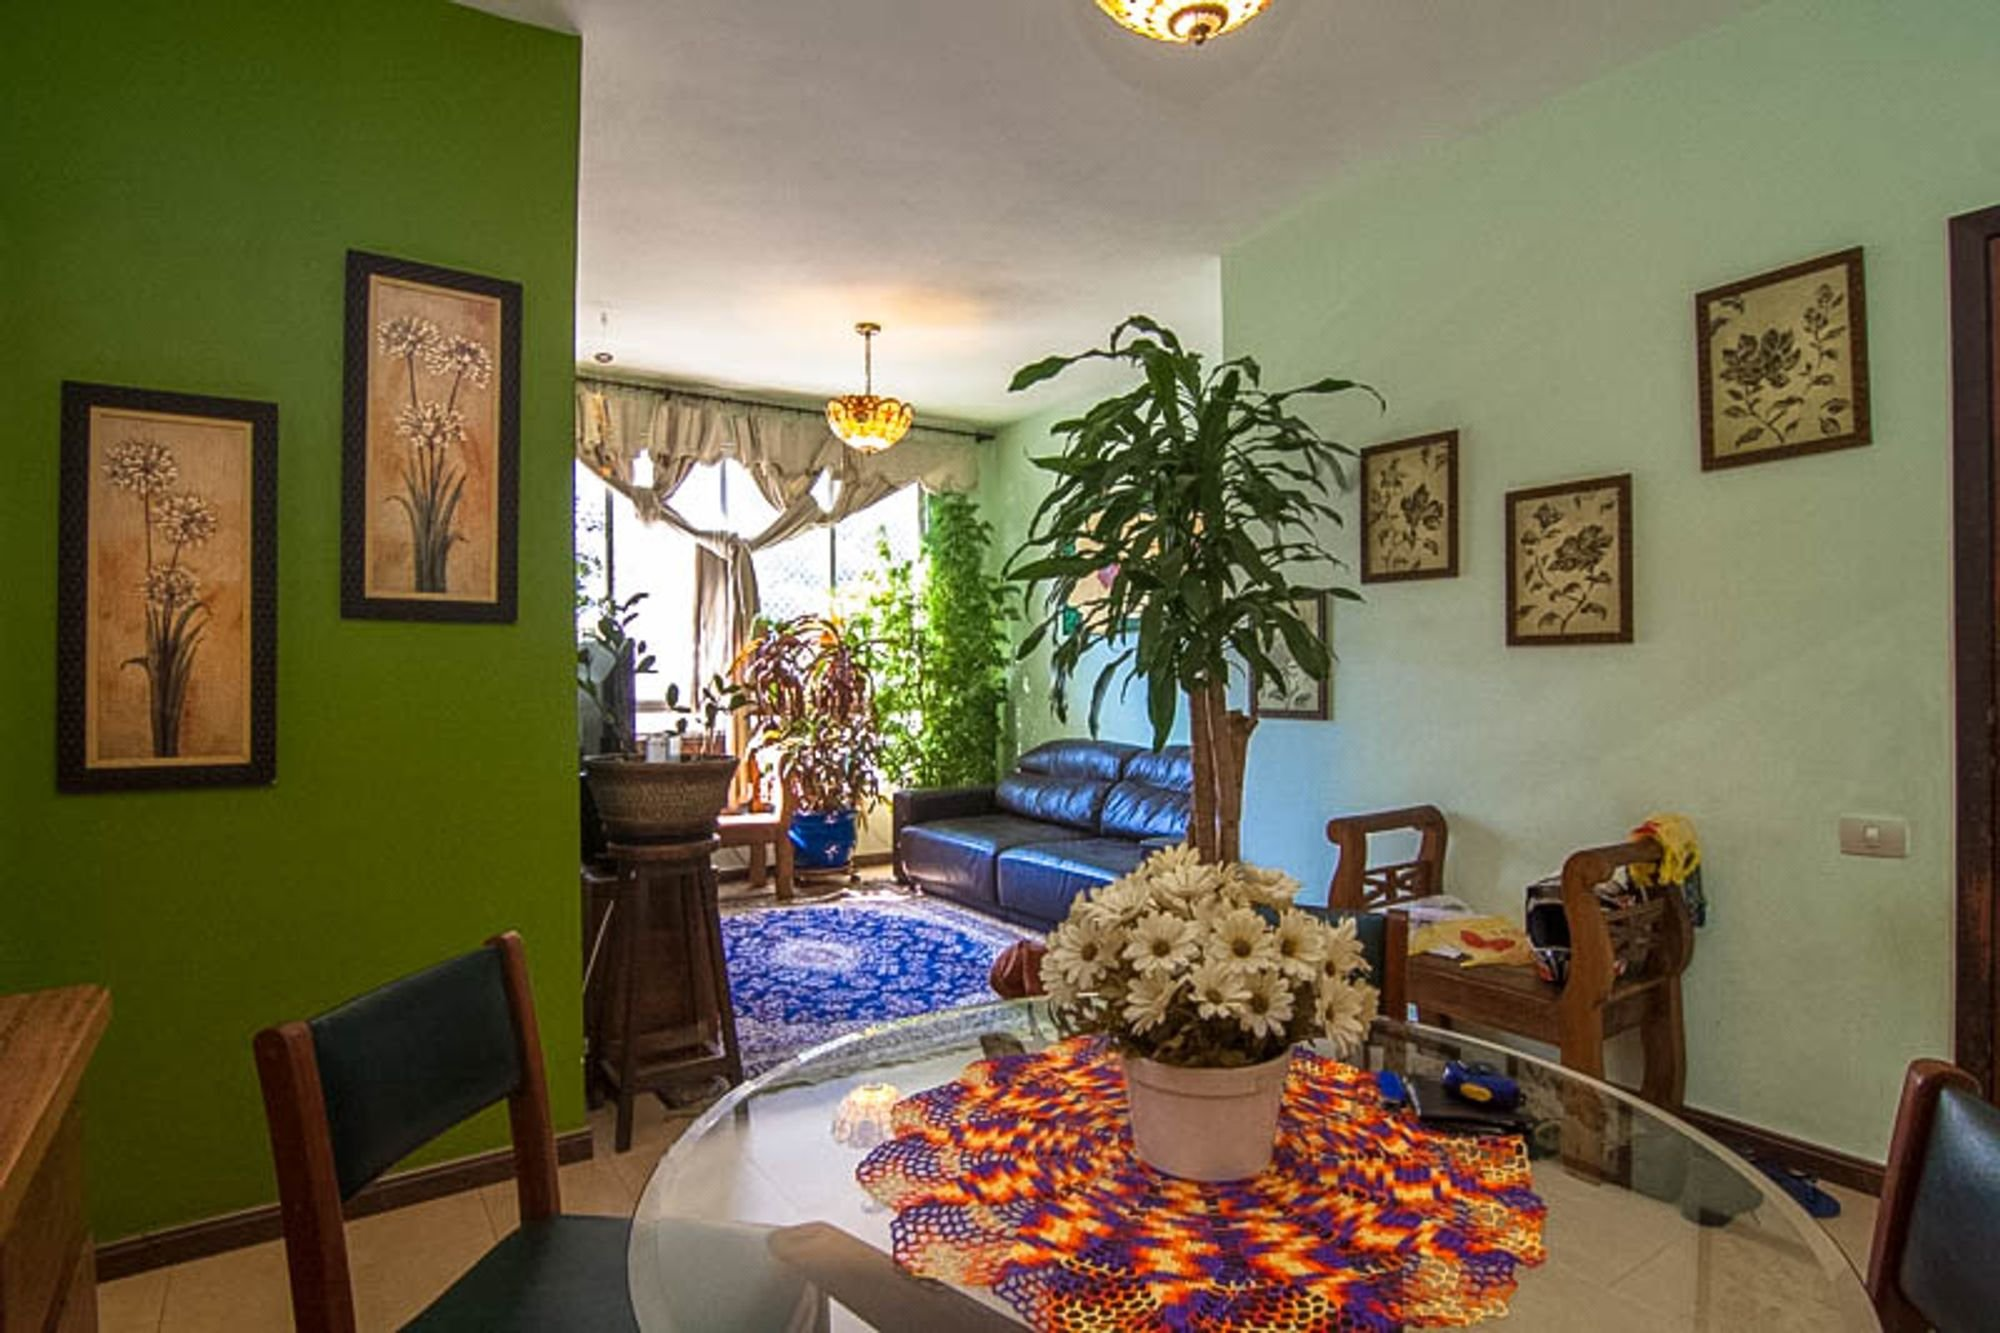 Foto de Sala com vaso de planta, sofá, vaso, cadeira, mesa de jantar